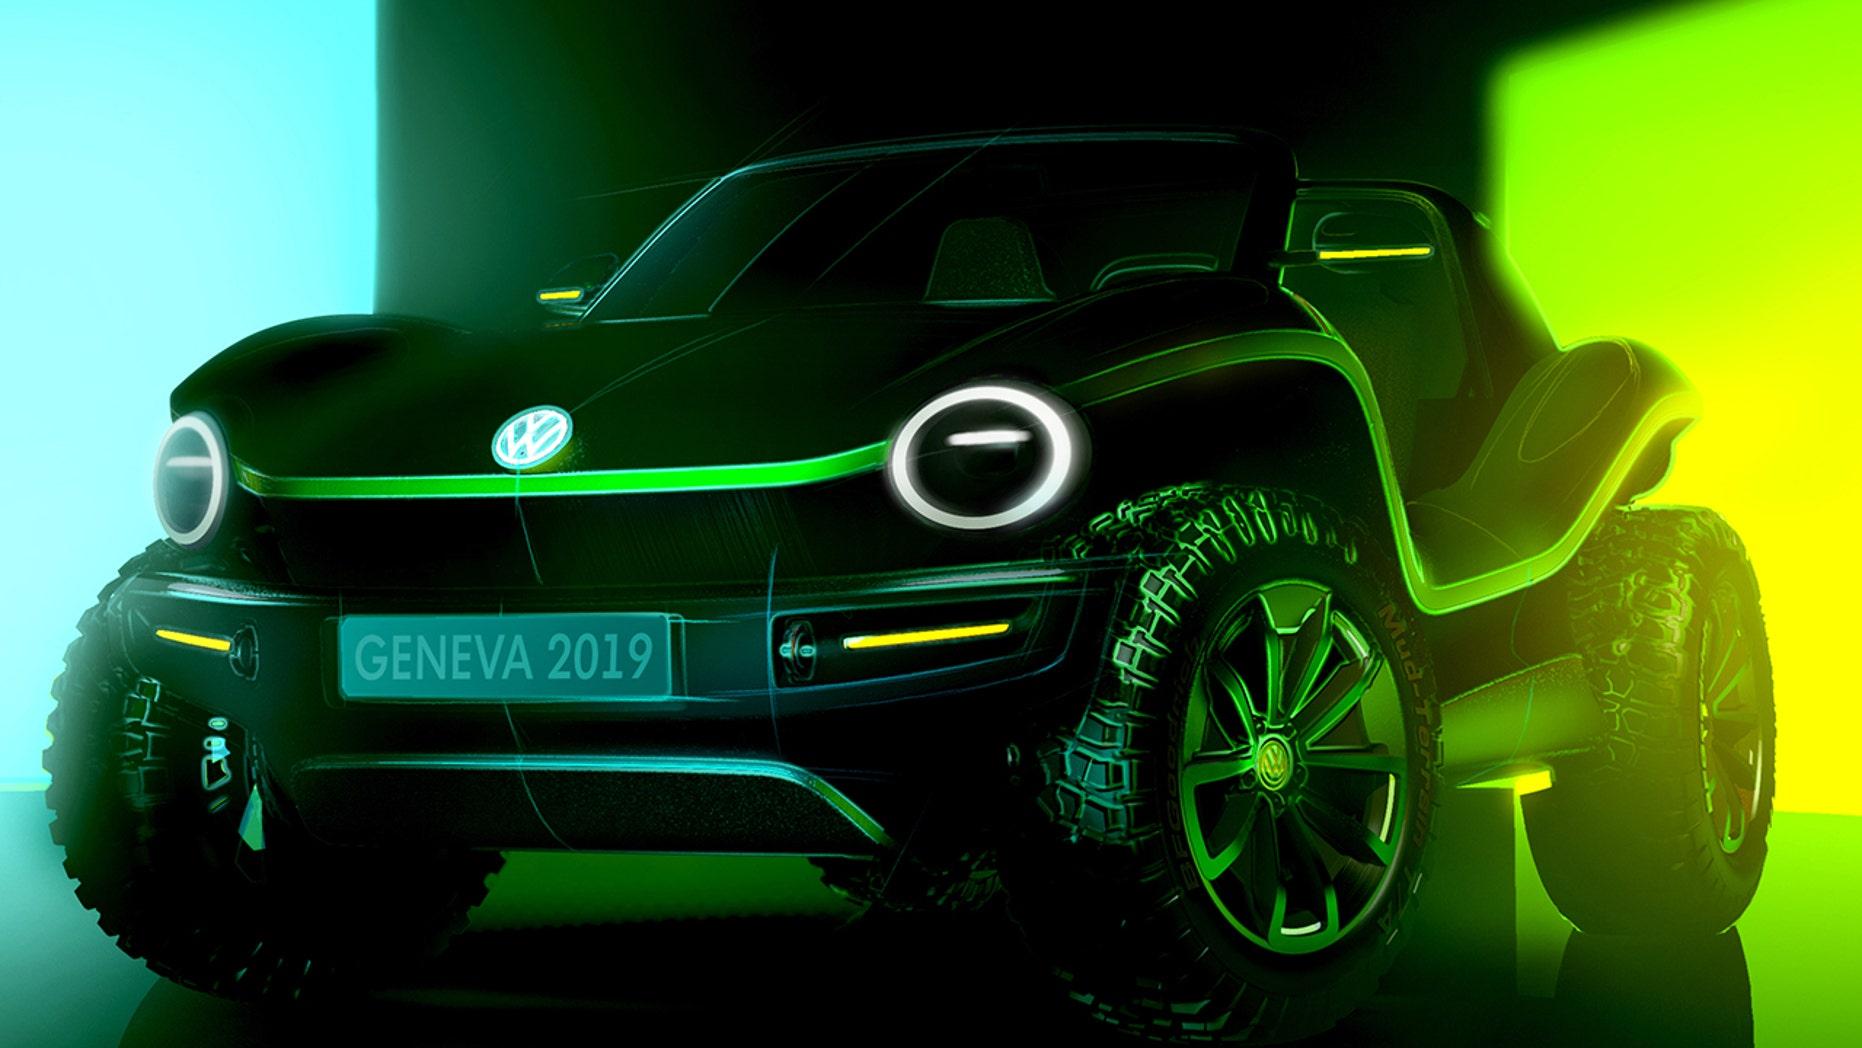 Volkswagen Is Bringing Back The Dune Buggy